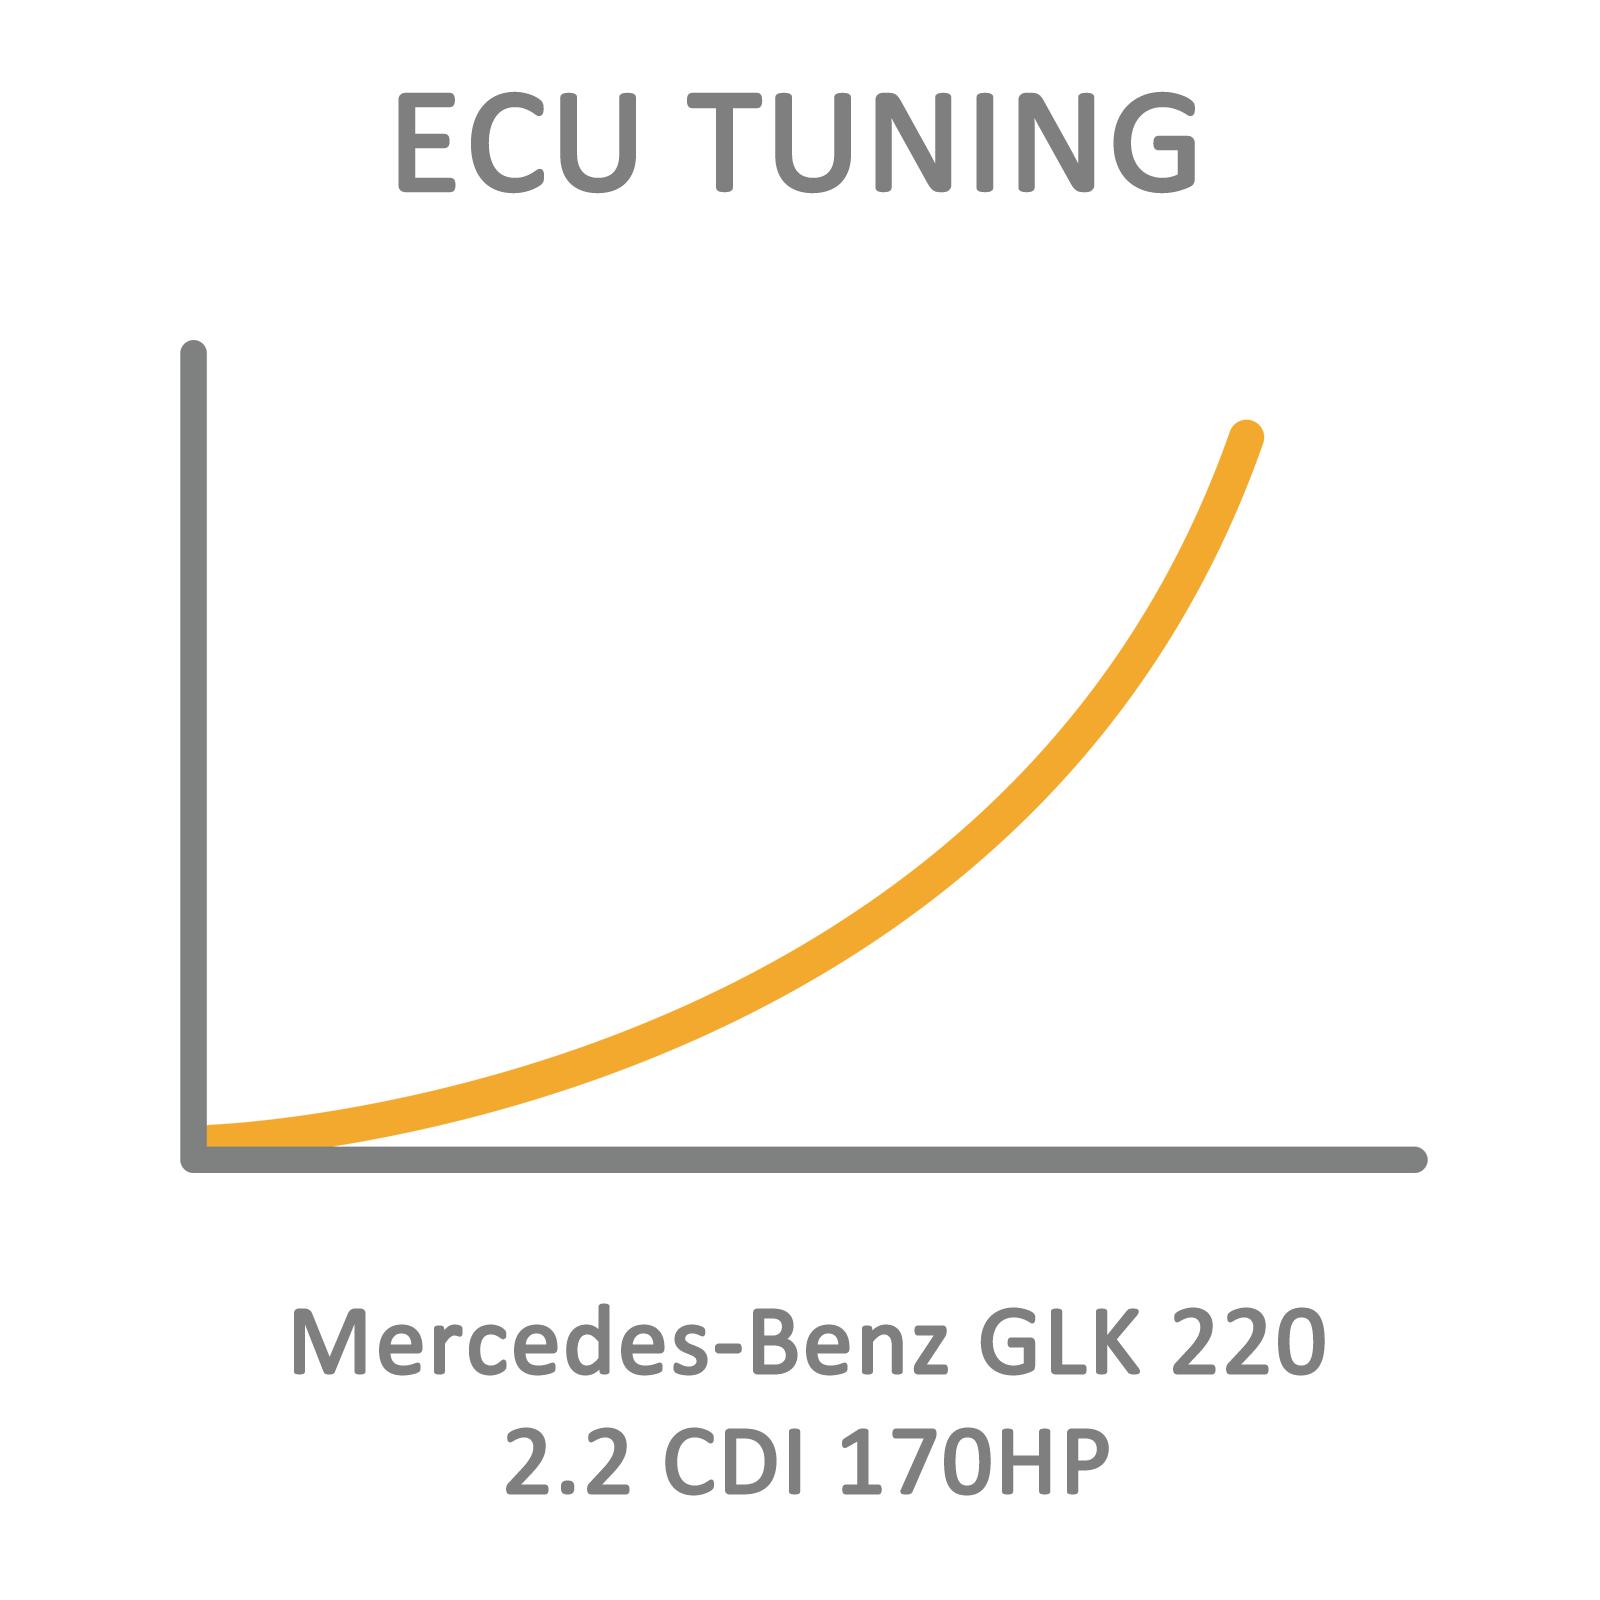 Mercedes-Benz GLK 220 2.2 CDI 170HP ECU Tuning Remapping